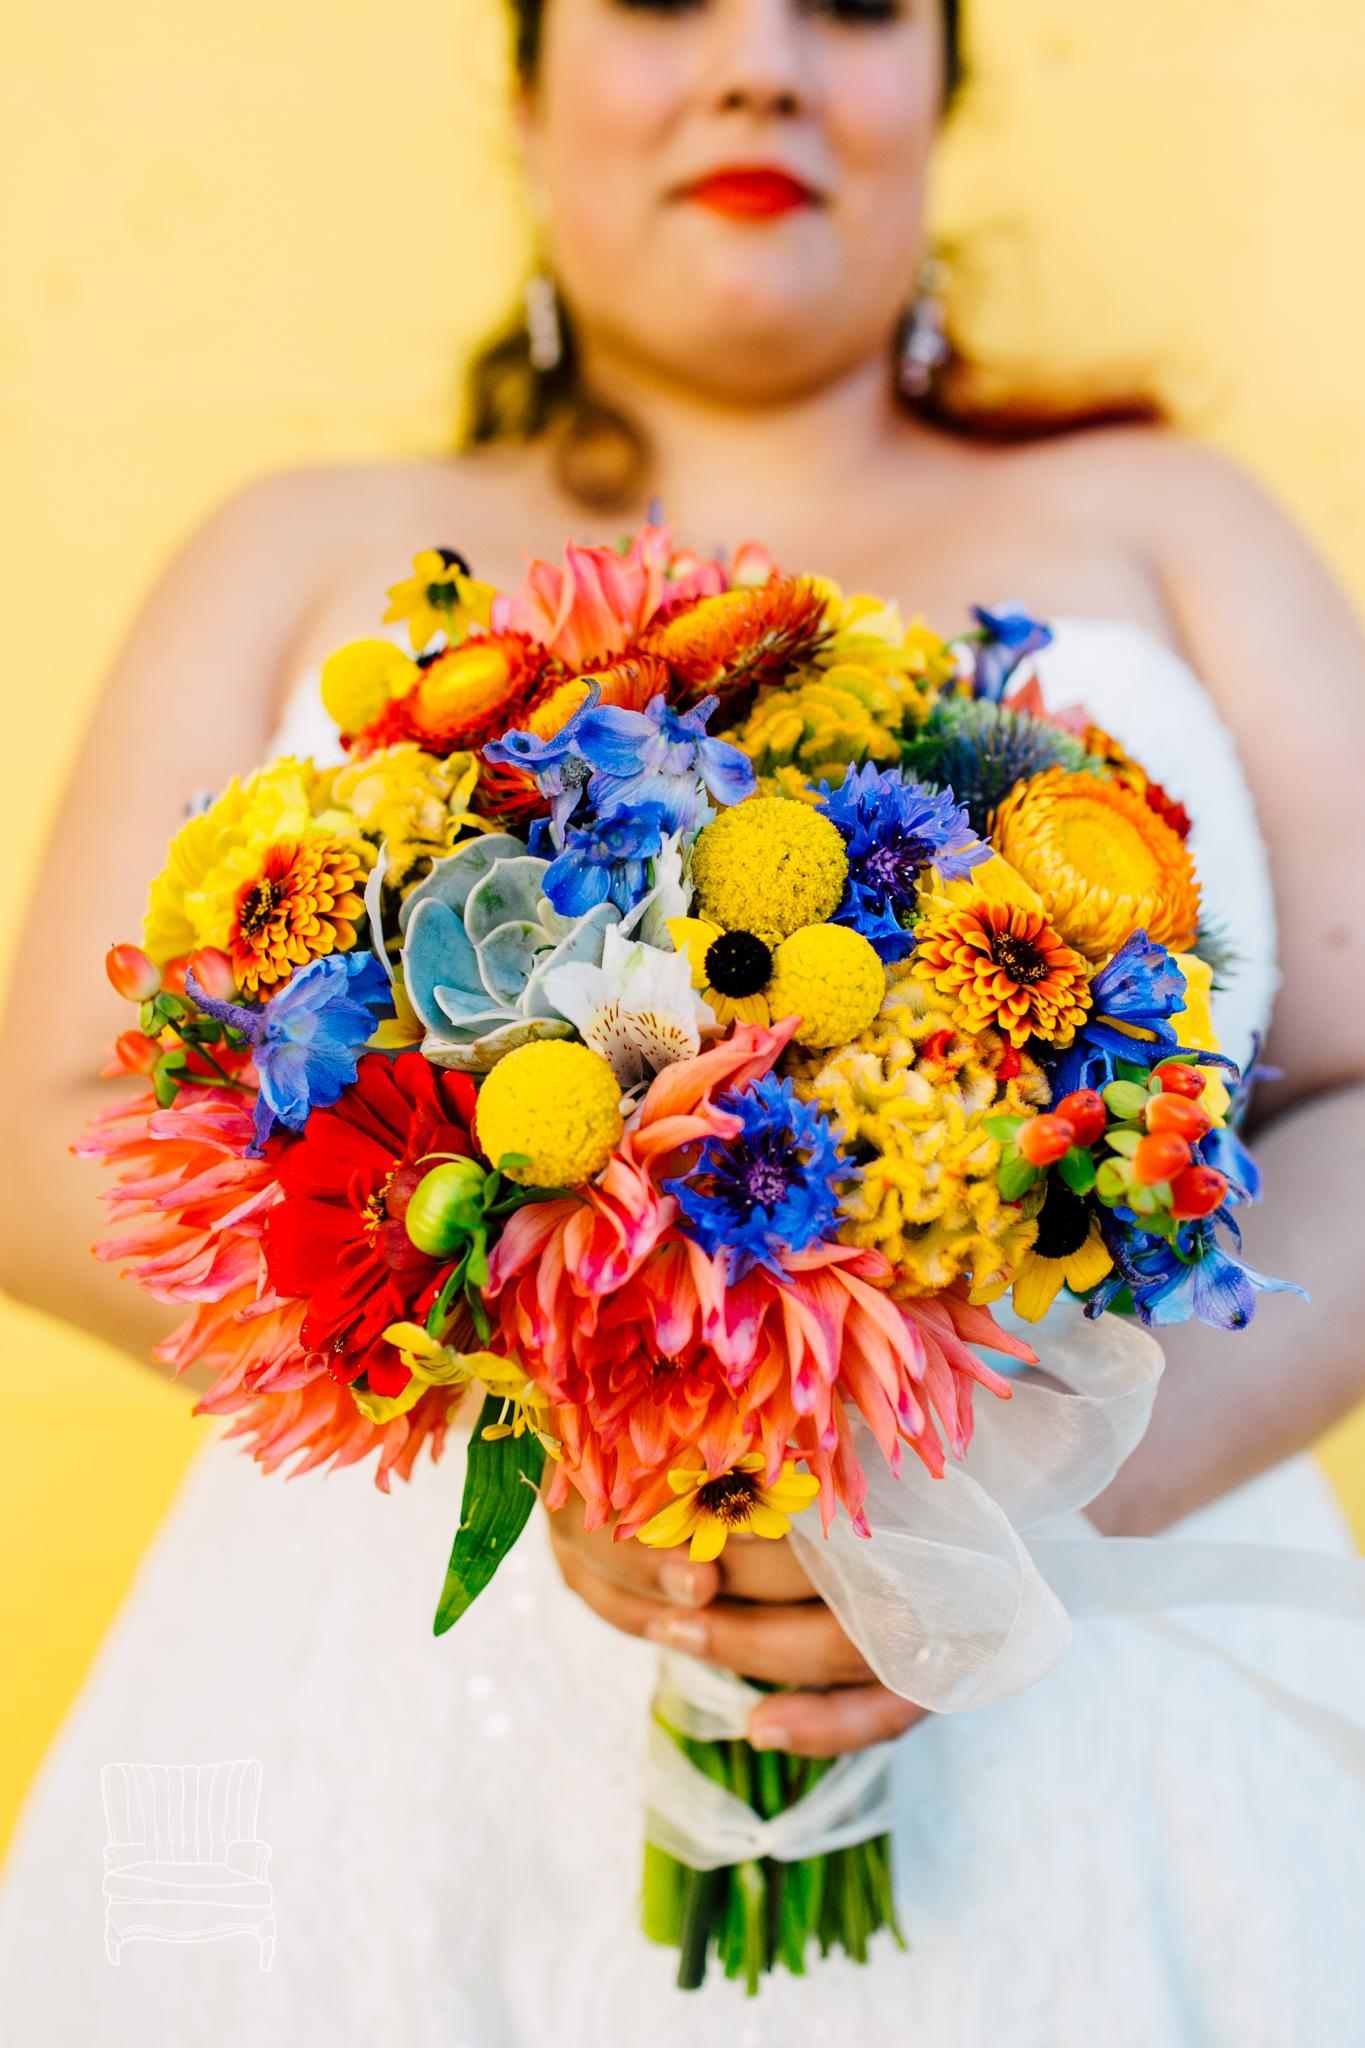 bellingham-whatcom-museum-wedding-katheryn-moran-photography-bribran-13.jpg